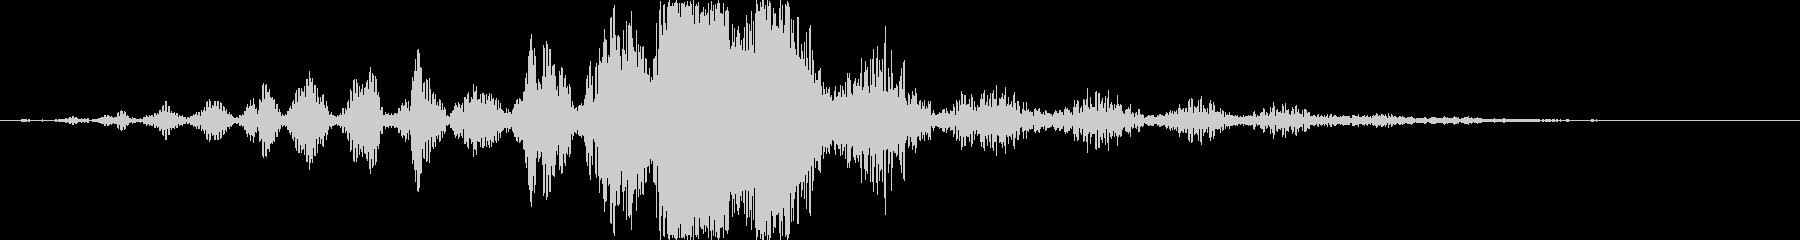 CINEMATIC WHOOSH 02の未再生の波形